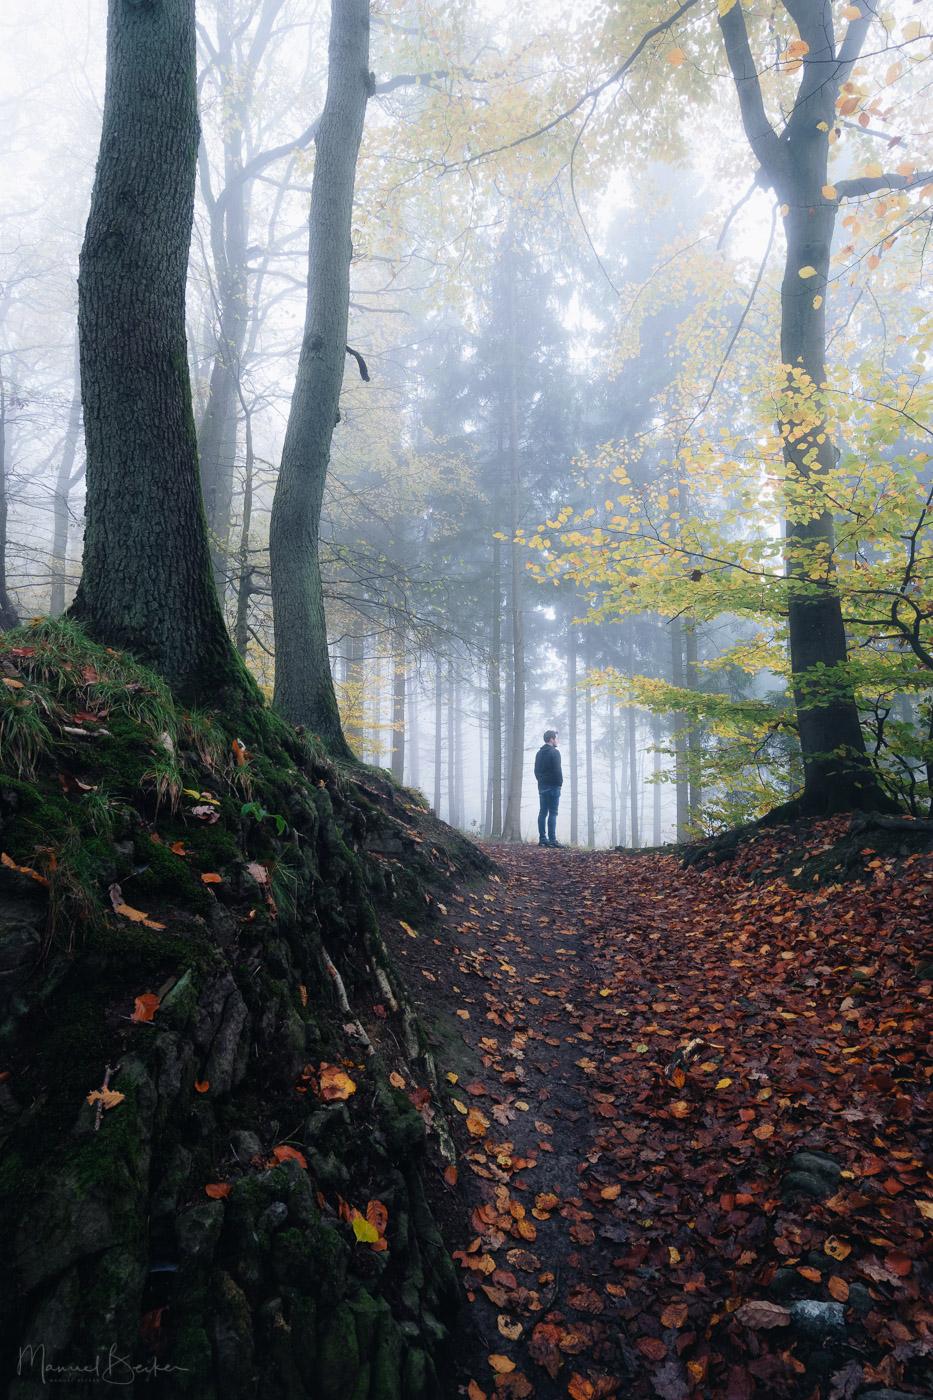 Path up to 3-Lake-View, Siebengebirge, Germany